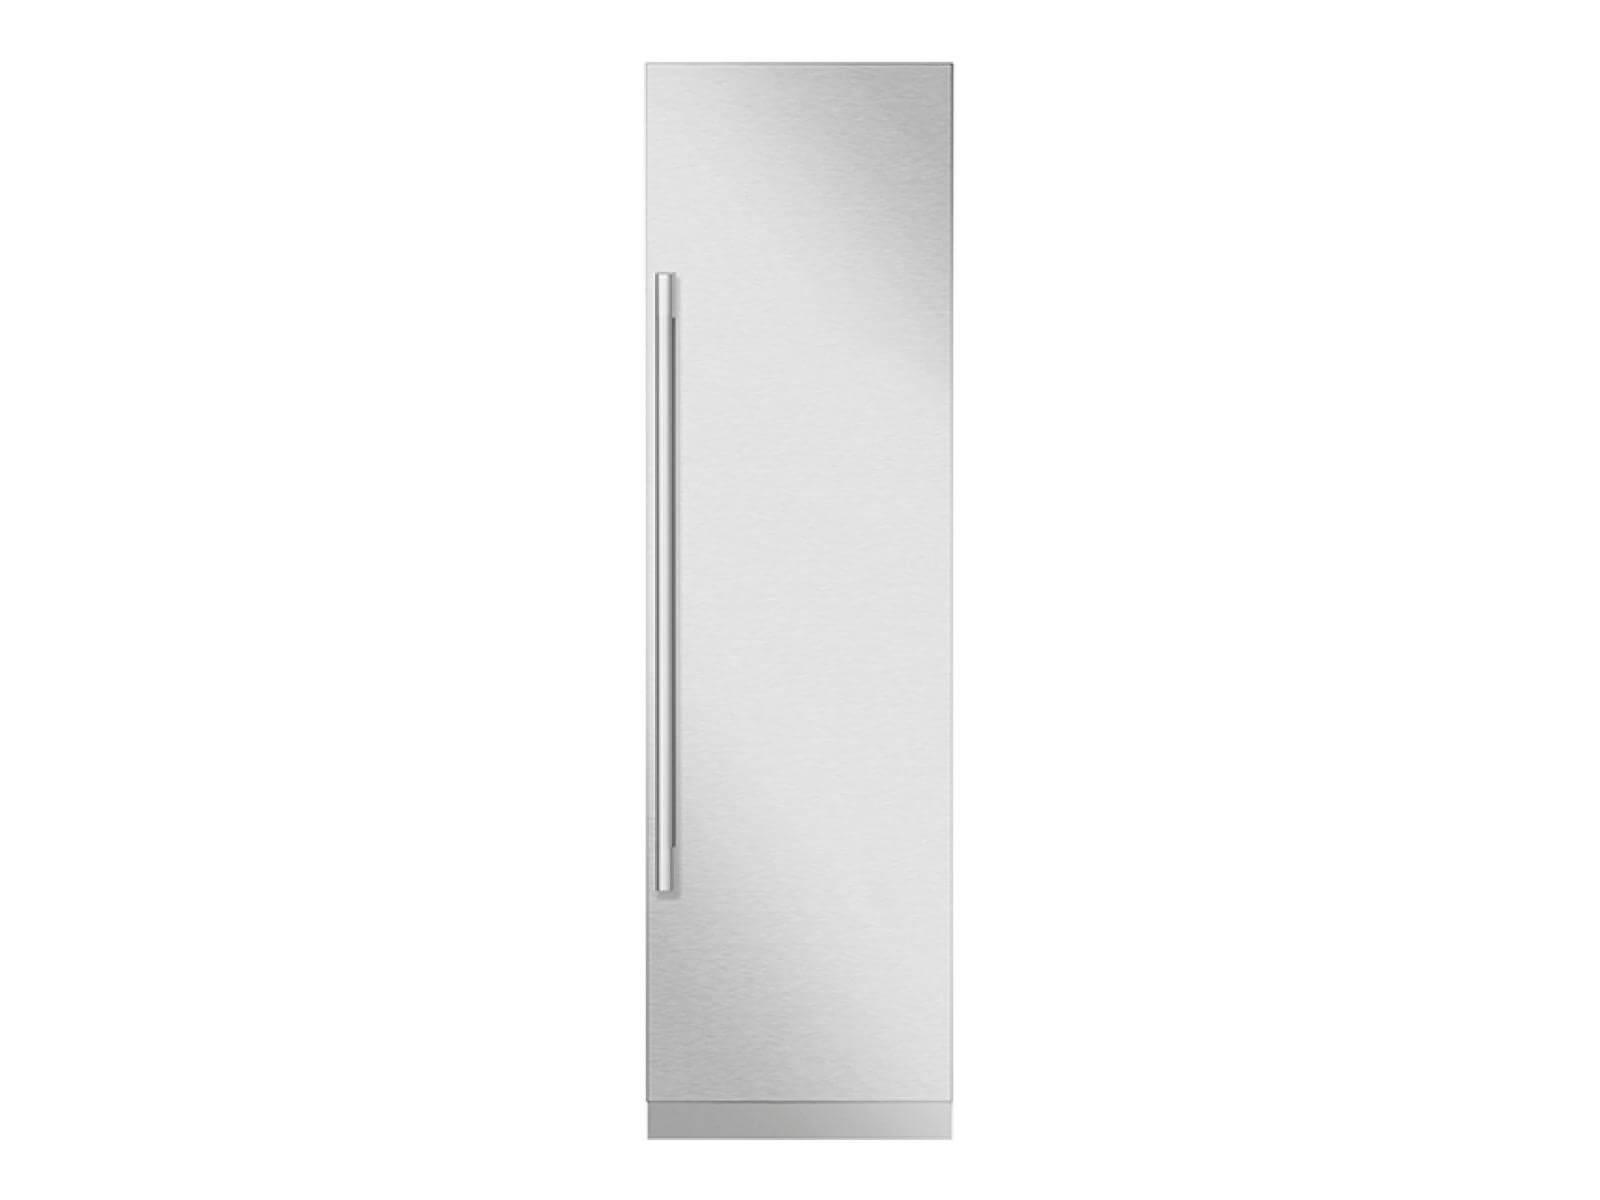 24-inch Integrated Column Refrigerator